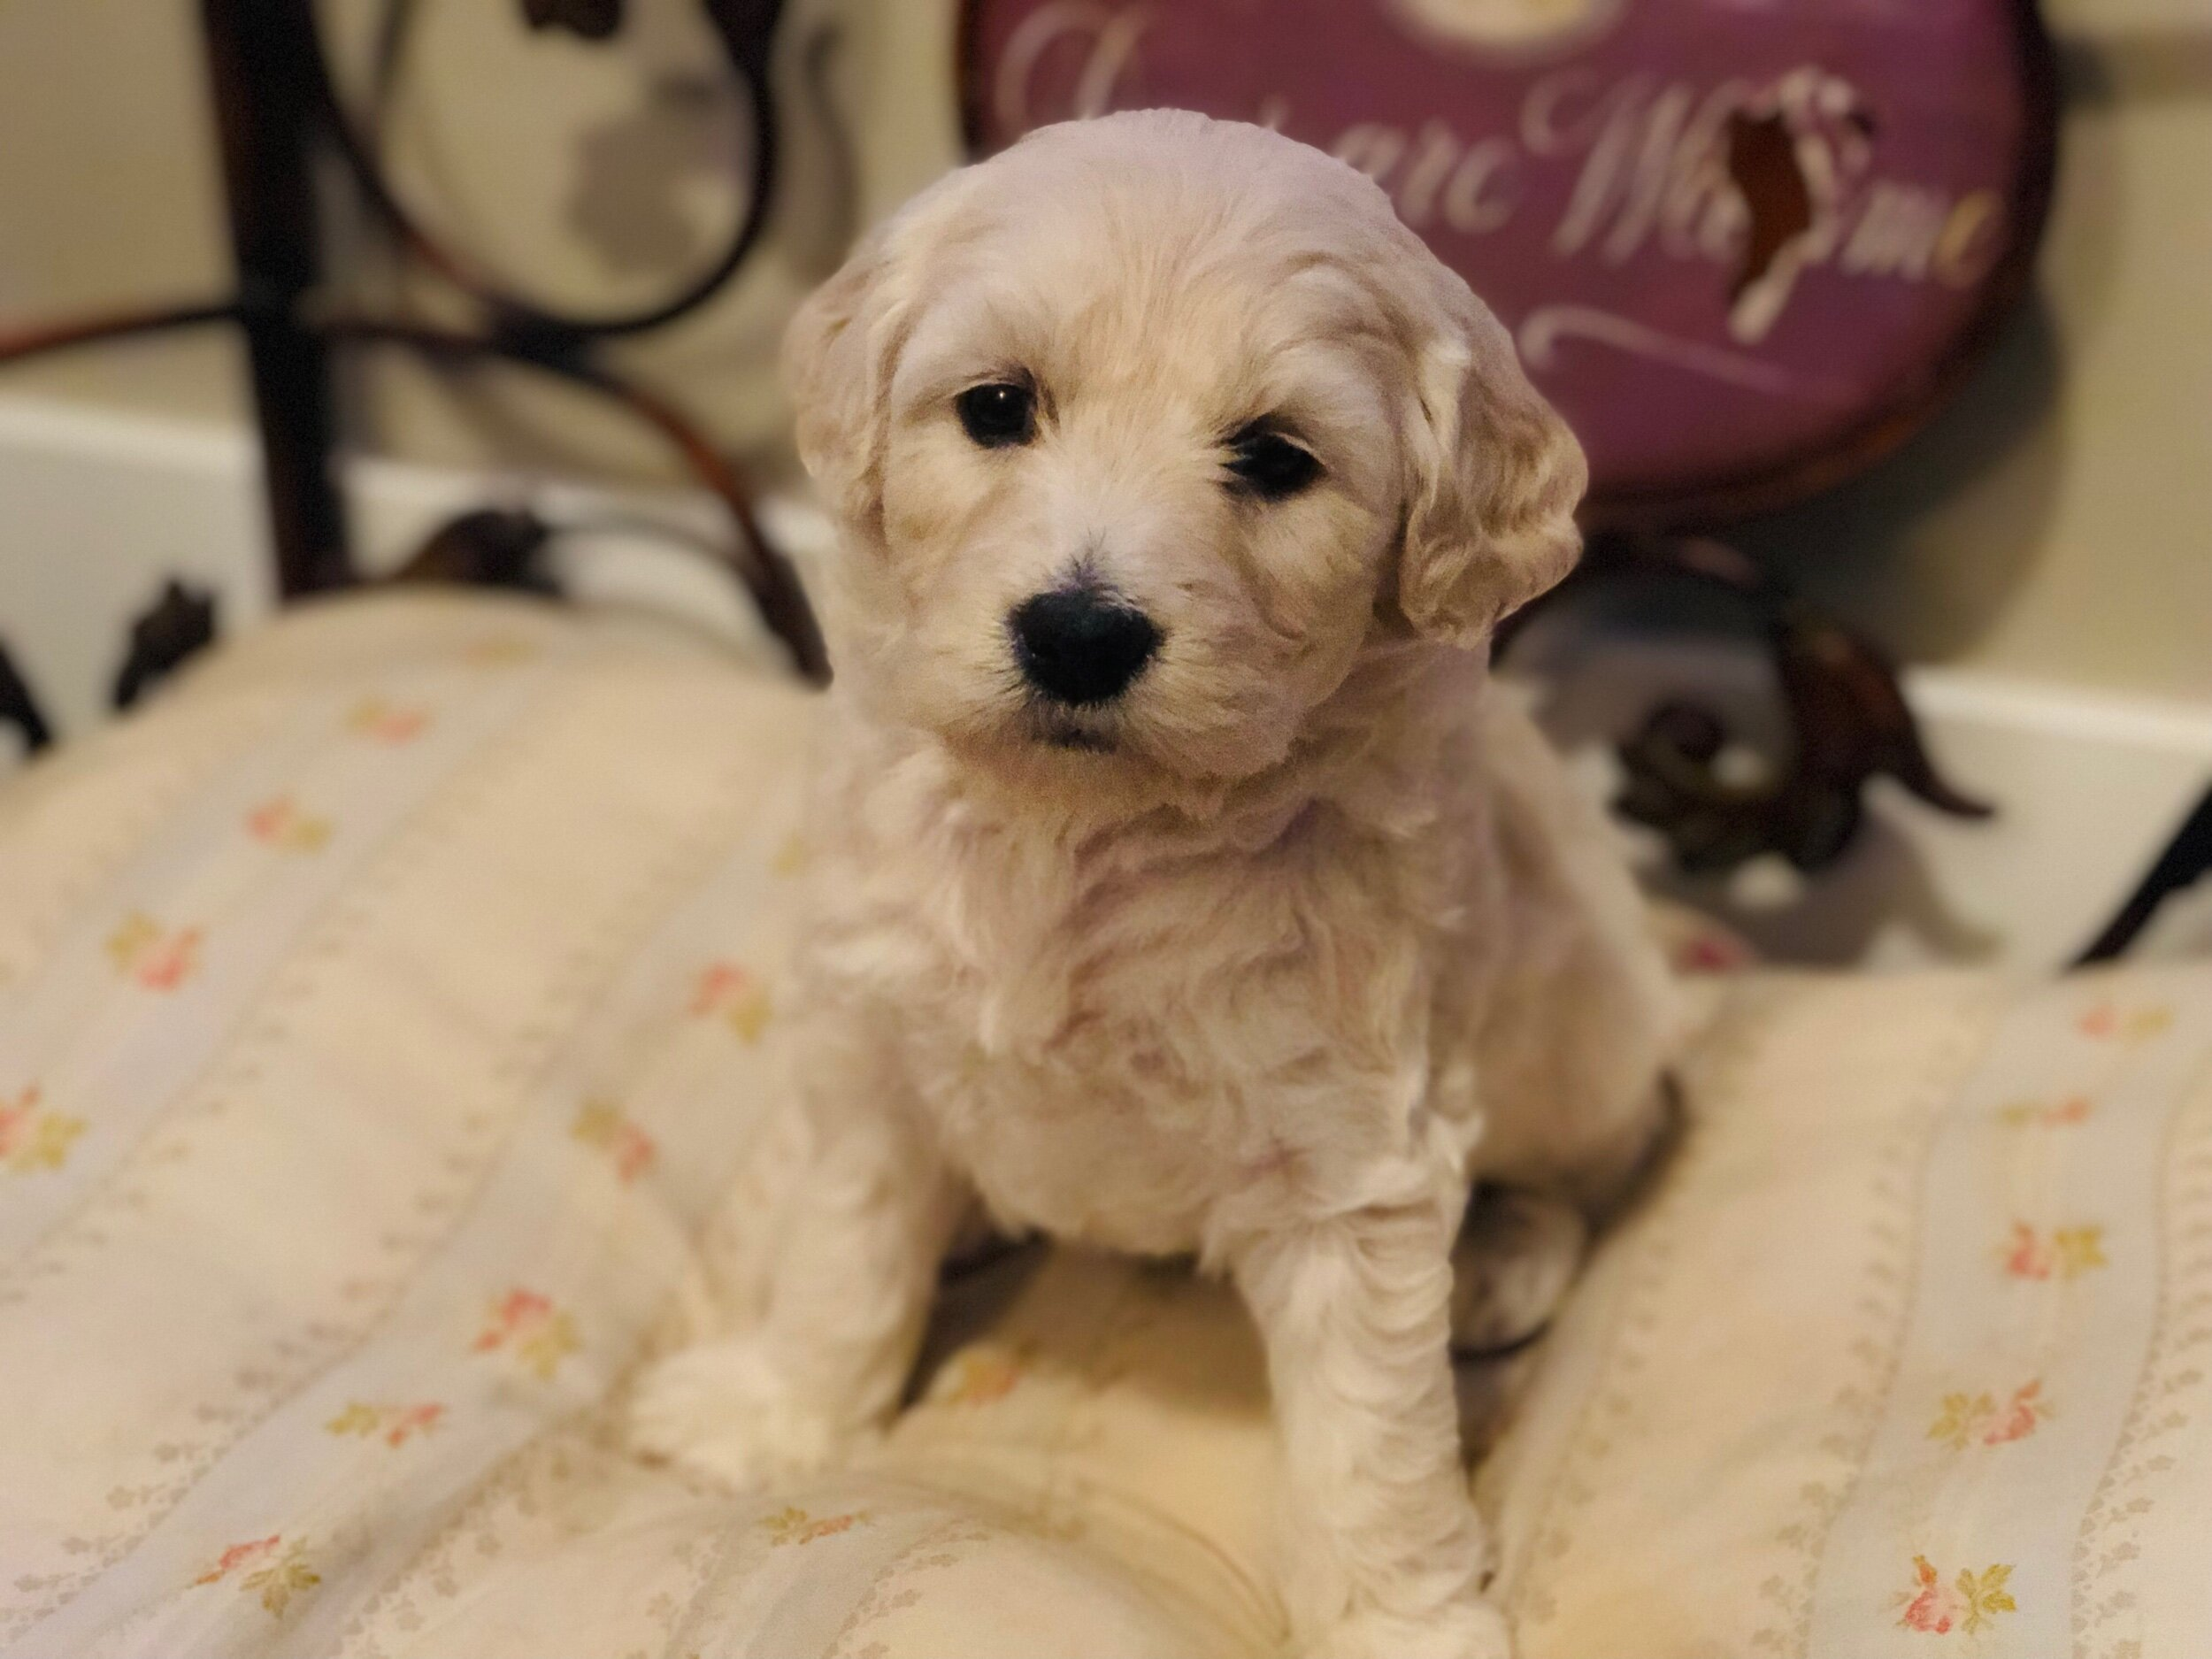 This is Steph 5-weeks-old